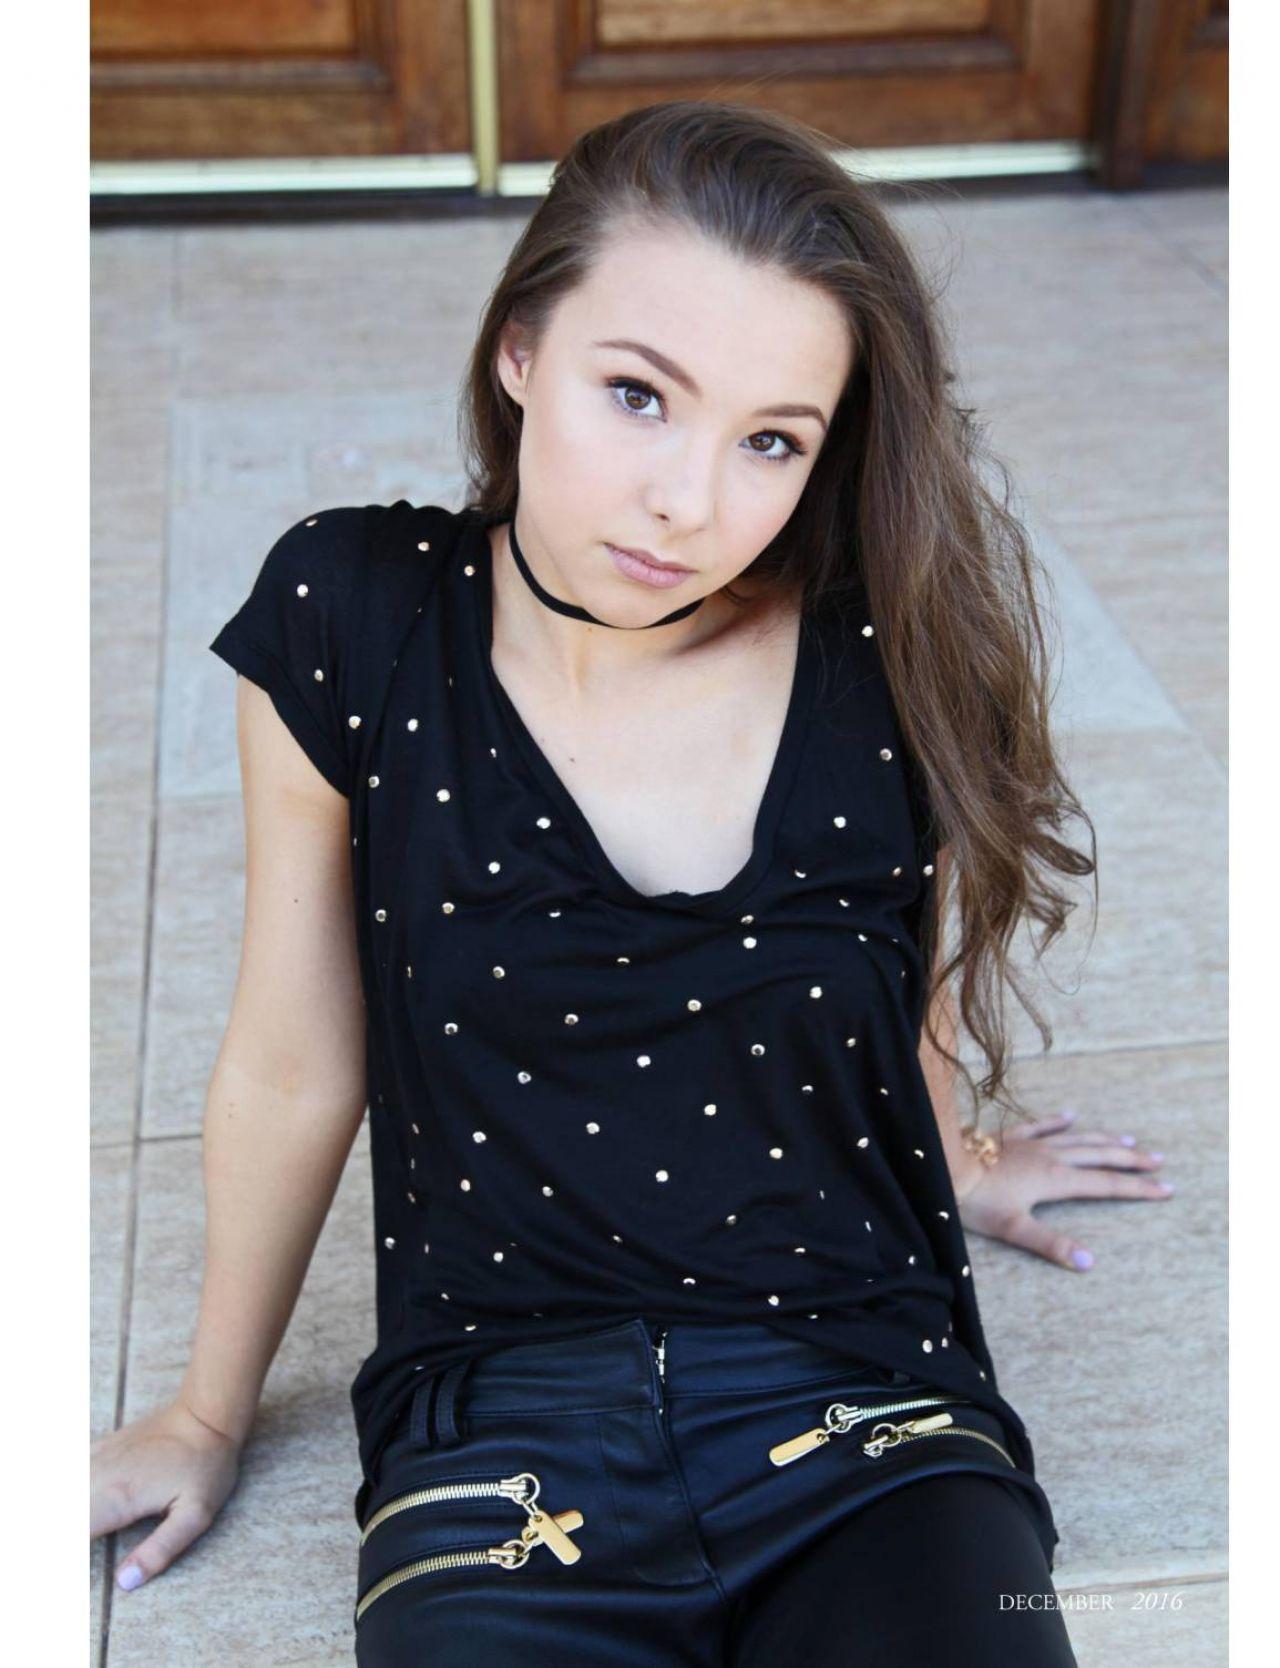 Sophia Lucia - Nation-... Alessandra Ambrosio Today